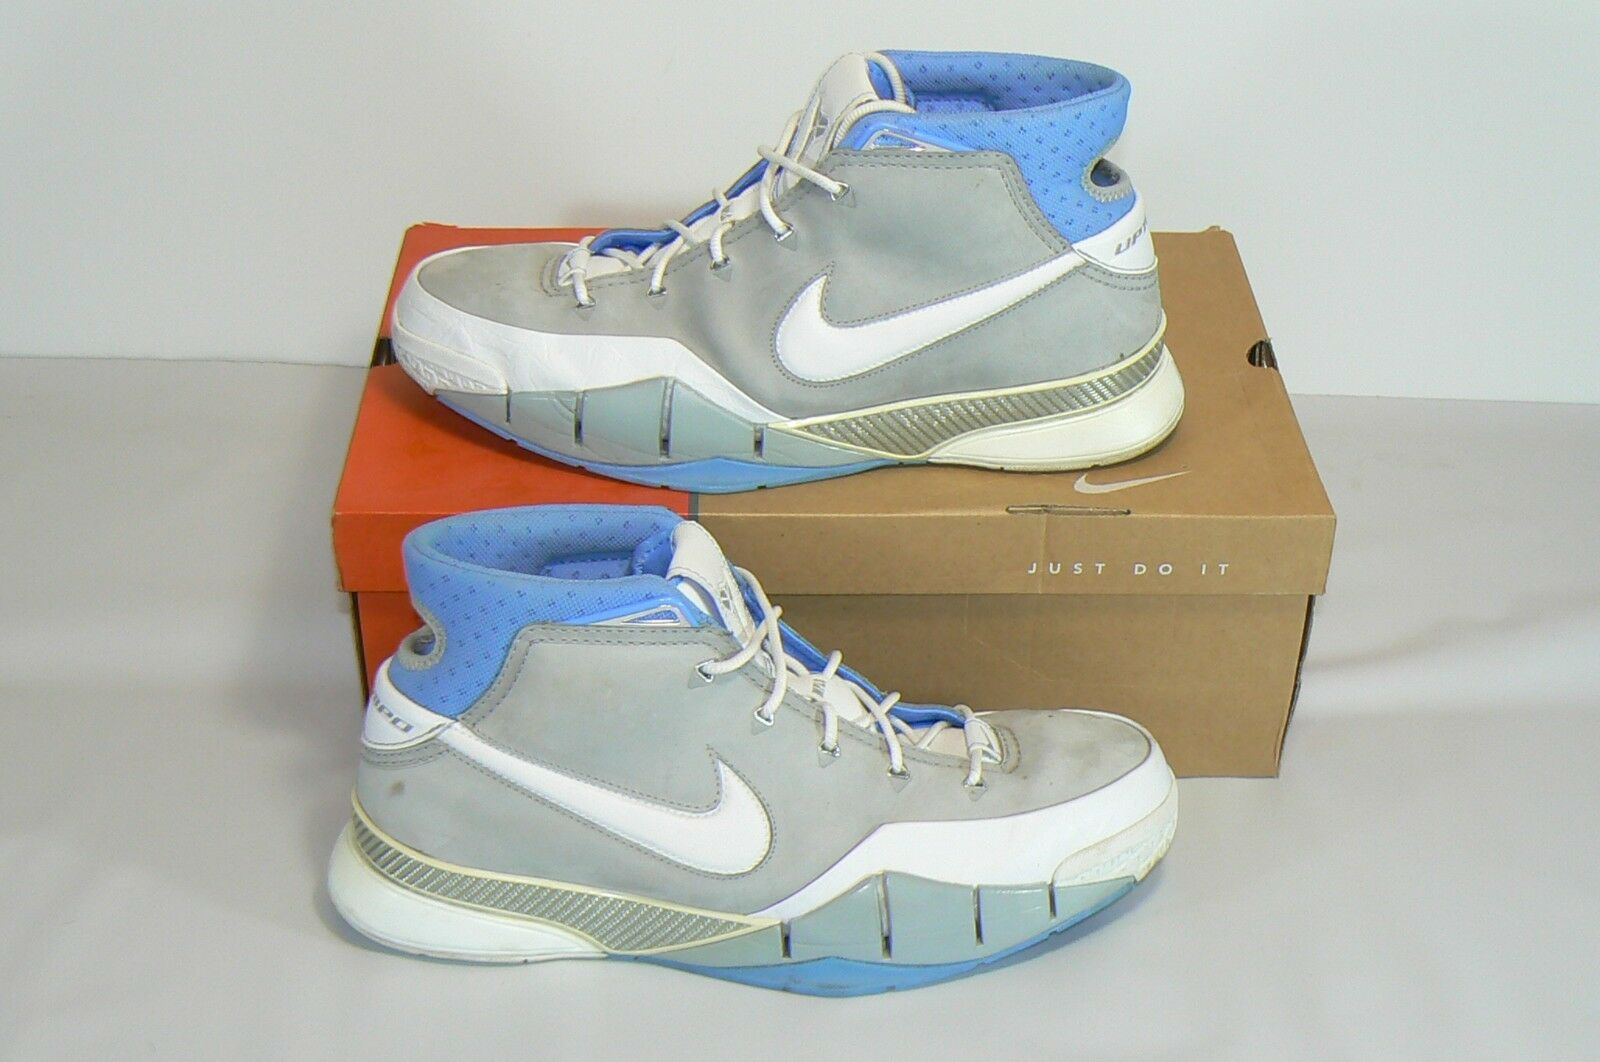 Kobe Nike Uptempo Zoom 1 Size 13 Men's MLPS edition Flint Grey Univ bluee